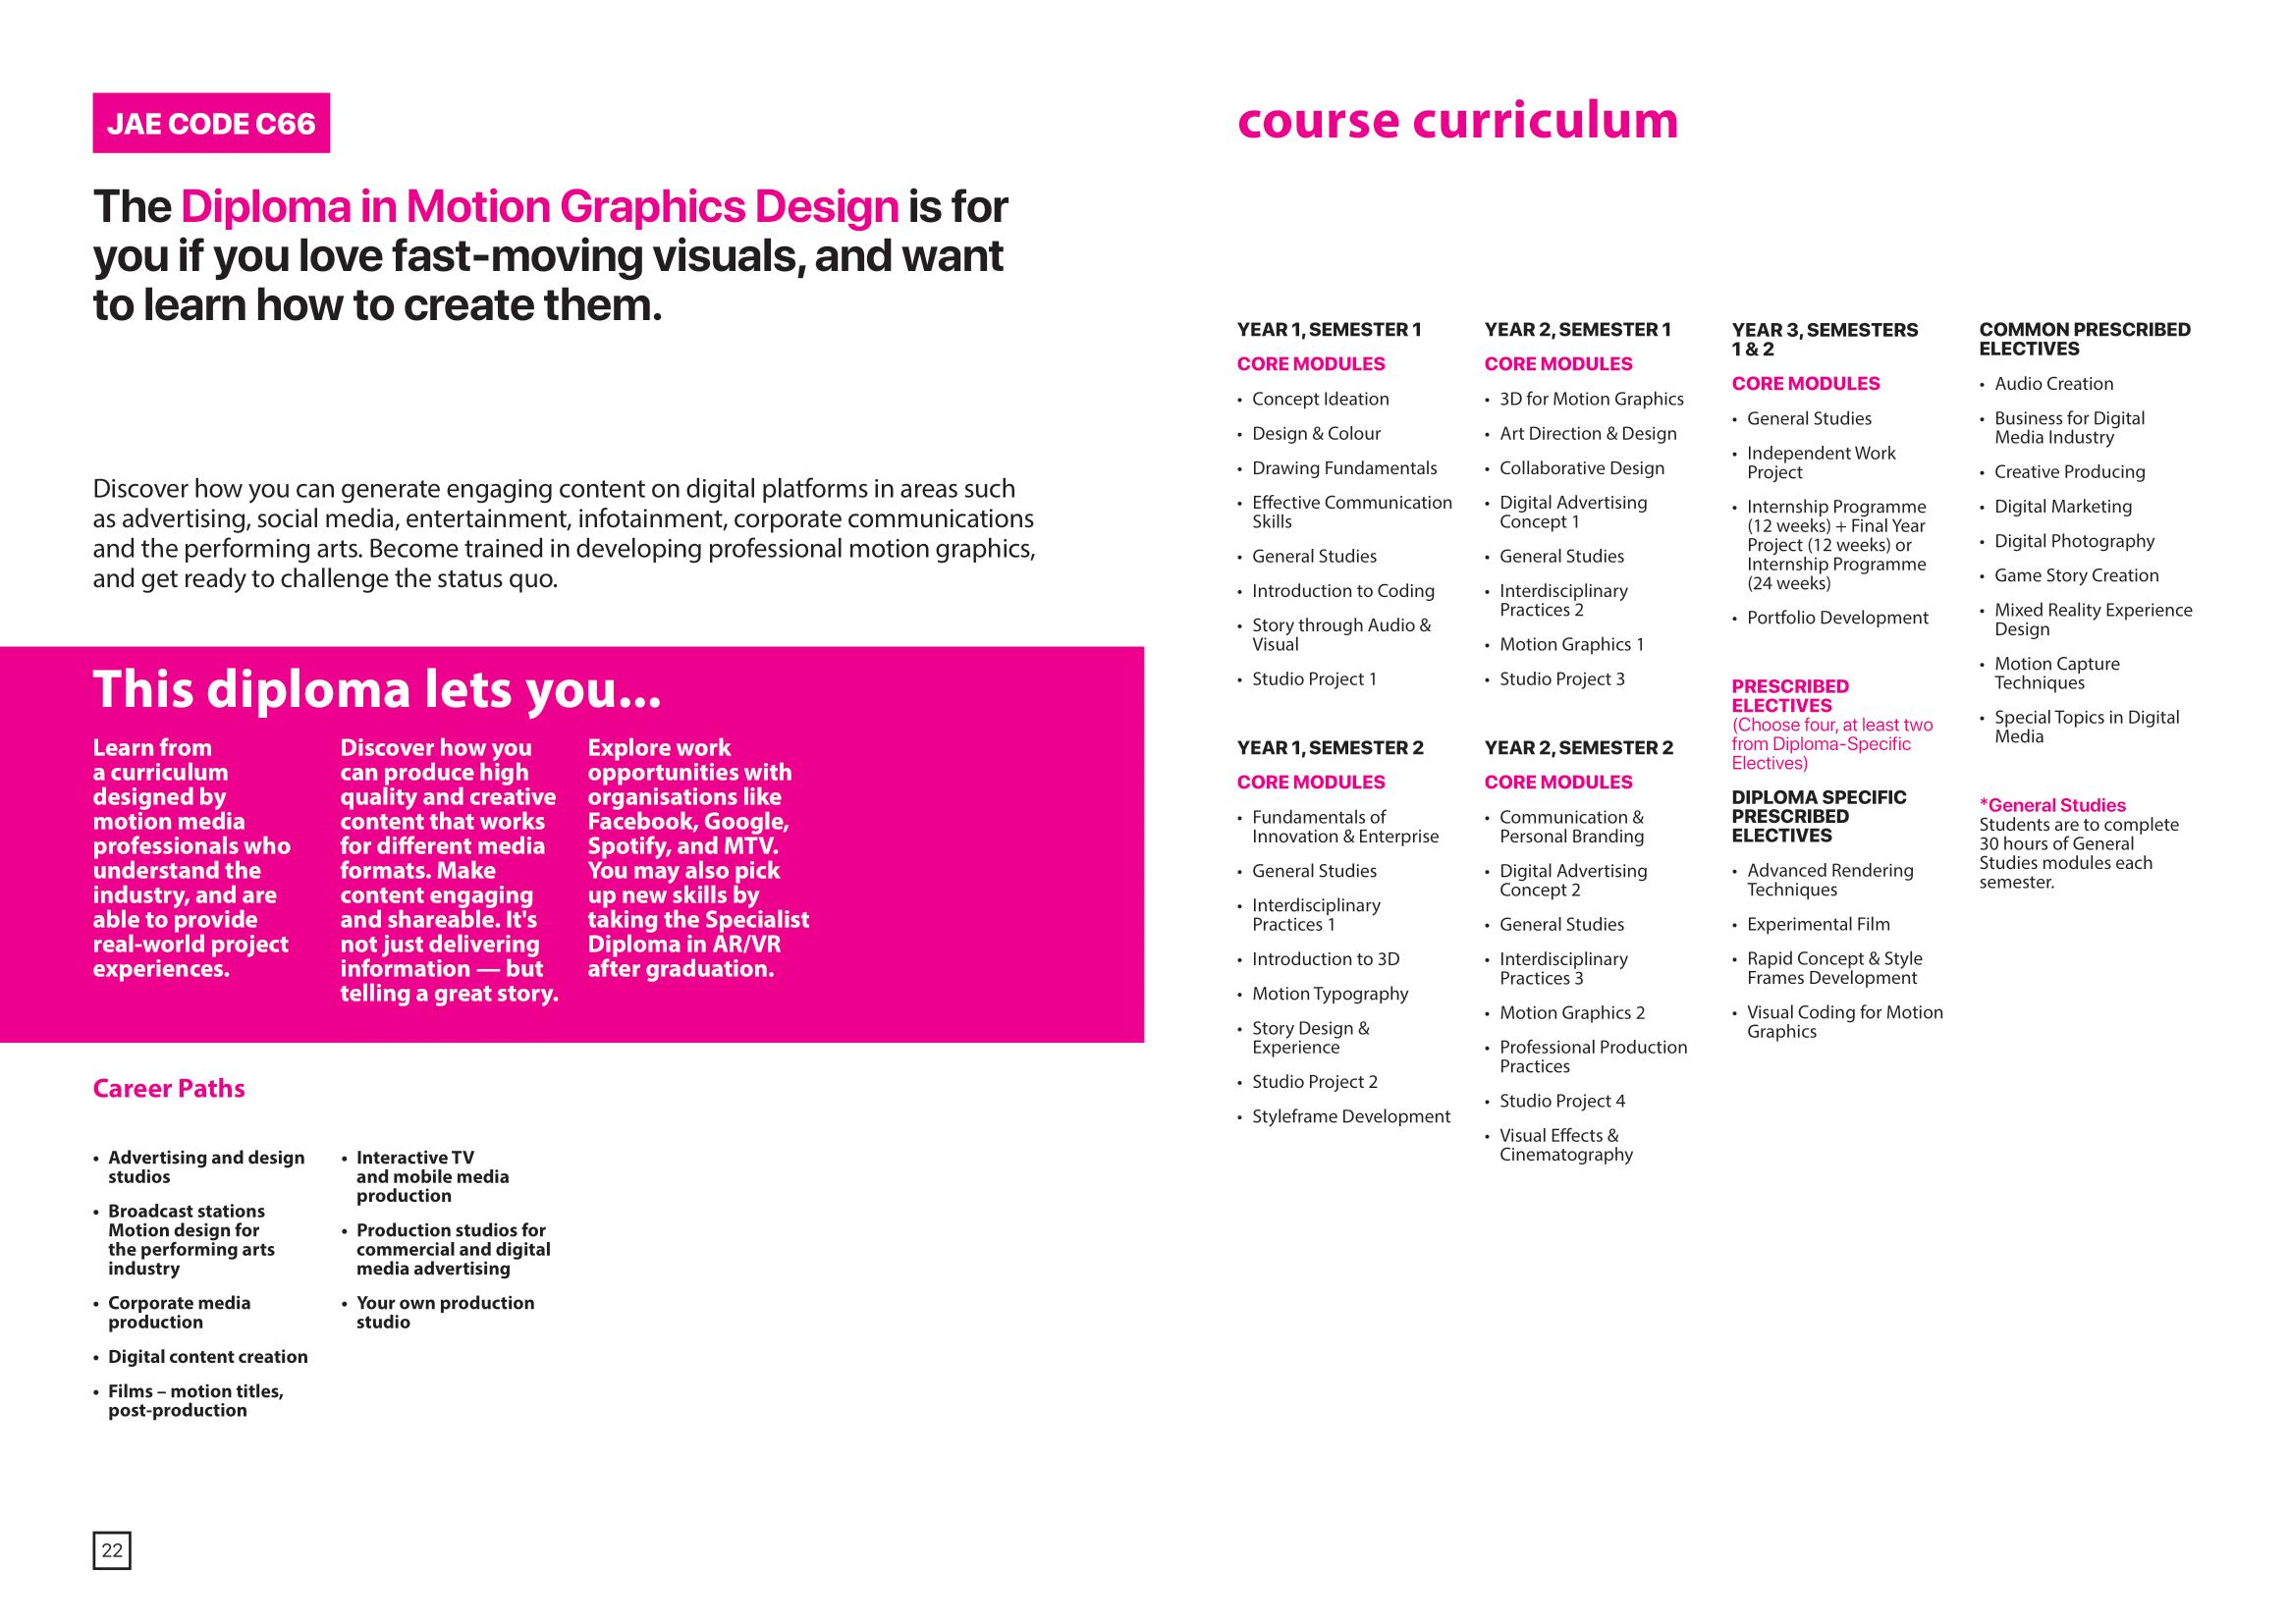 School of Interactive and Digital Media 2020-13